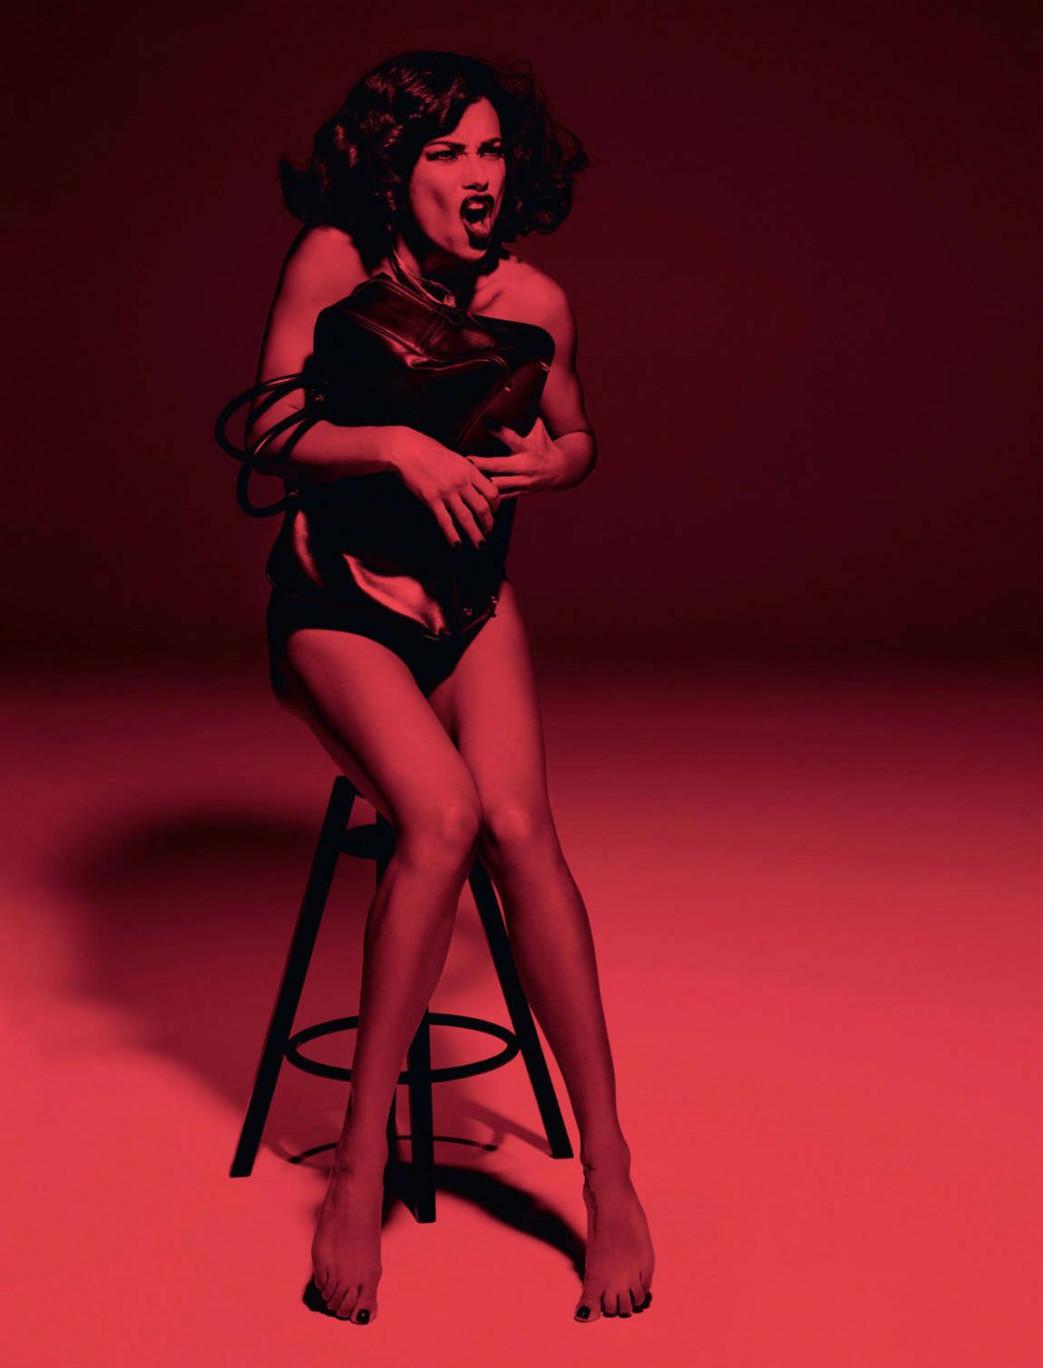 Adriana-Lima-sexy-poses-for-Love-Magazine-2016-2.jpg